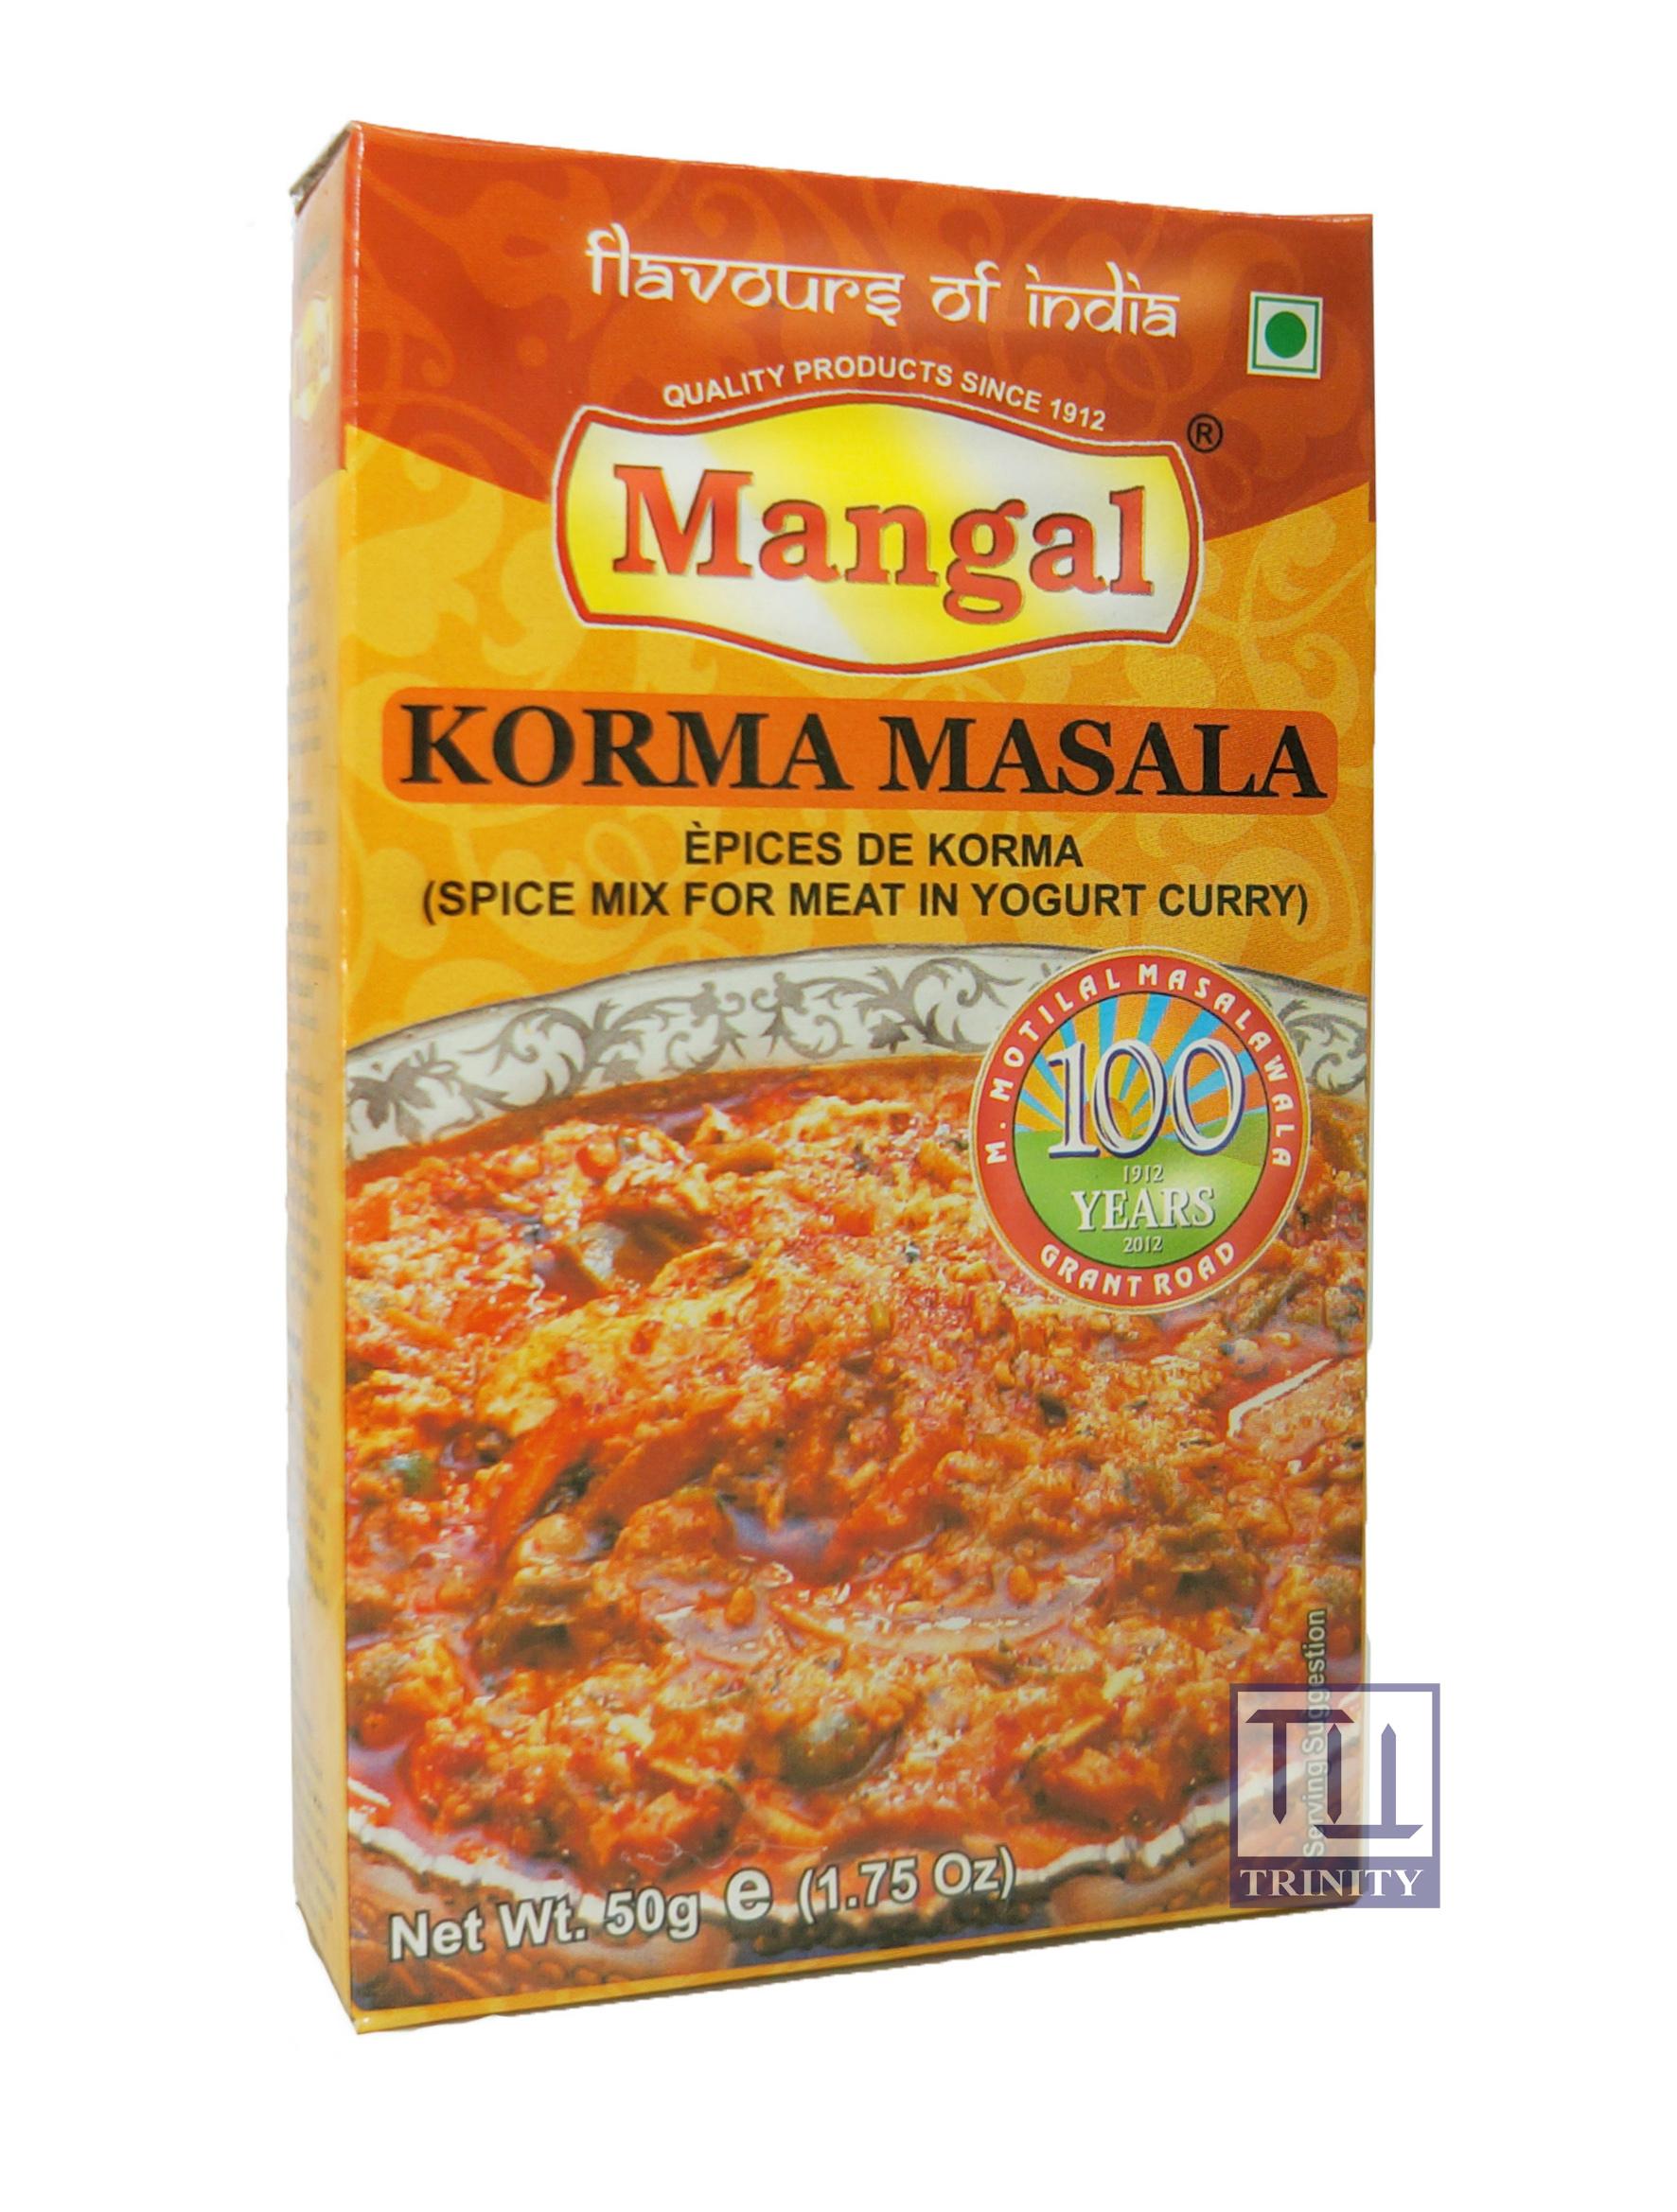 Mangal Korma  Masala 印度香料粉  (煮肉類優格用)